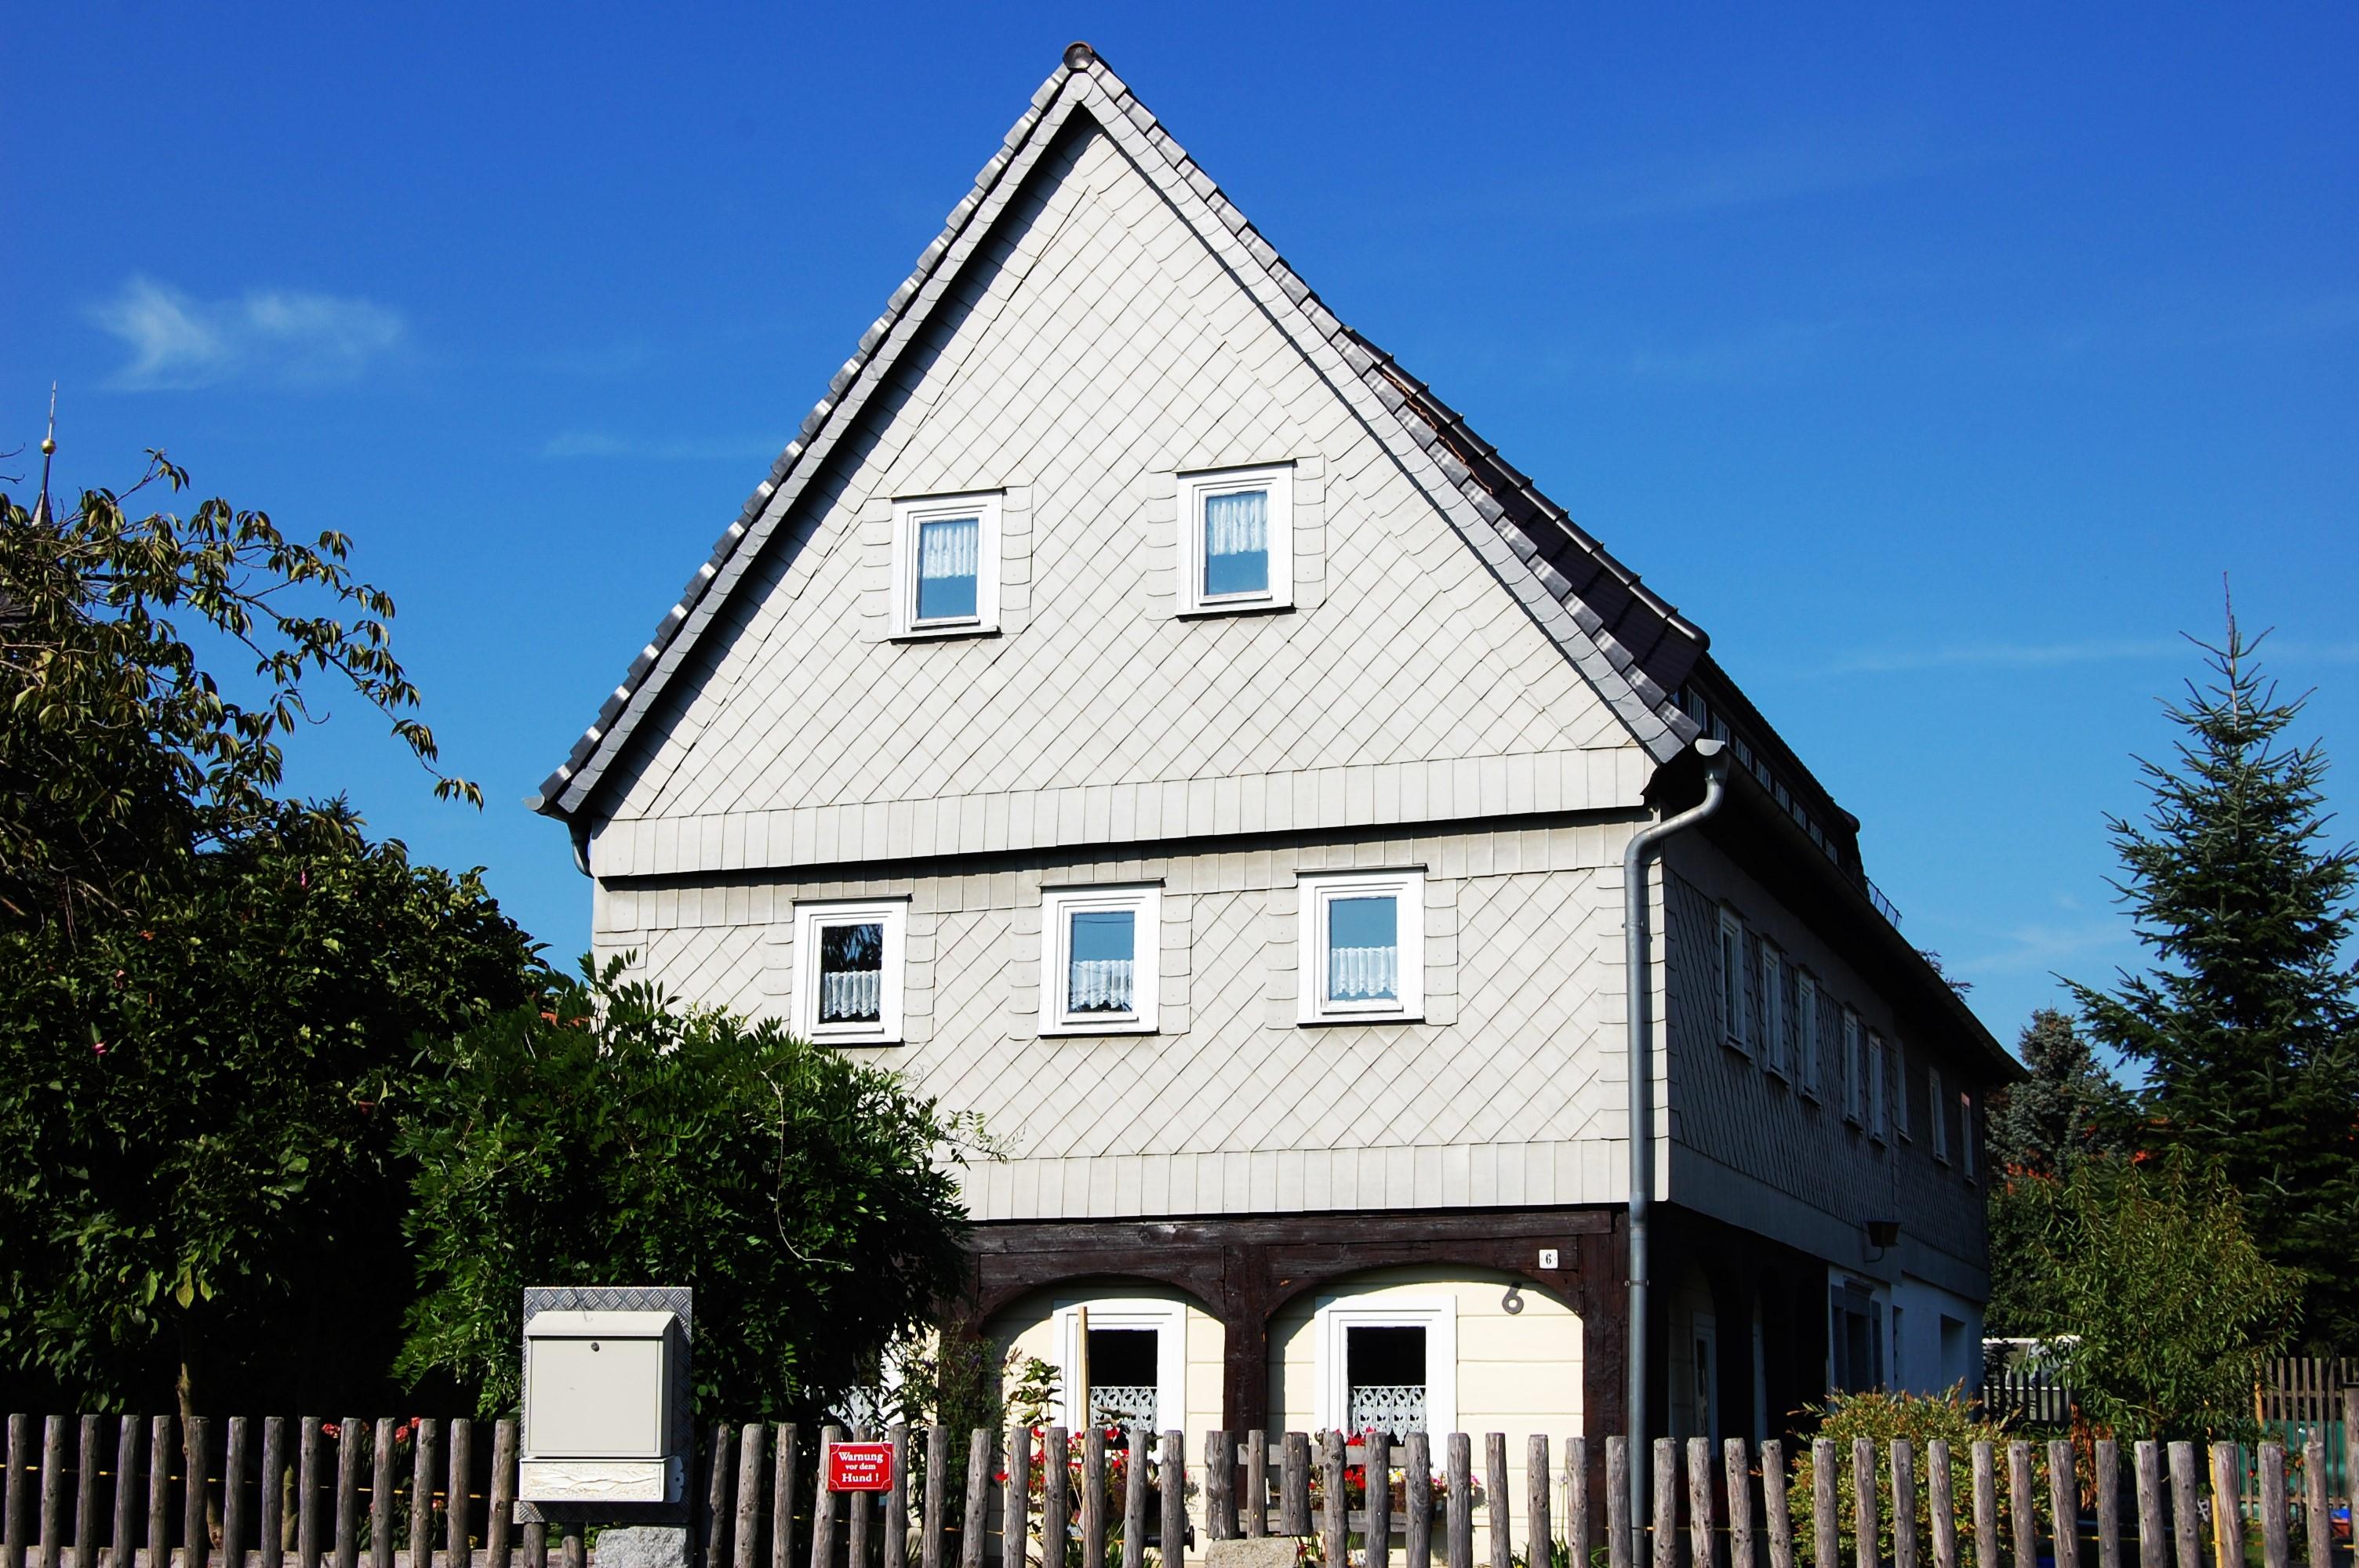 file umgebinde k the kollwitz stra e 6 walddorf 1 jpg wikimedia commons. Black Bedroom Furniture Sets. Home Design Ideas